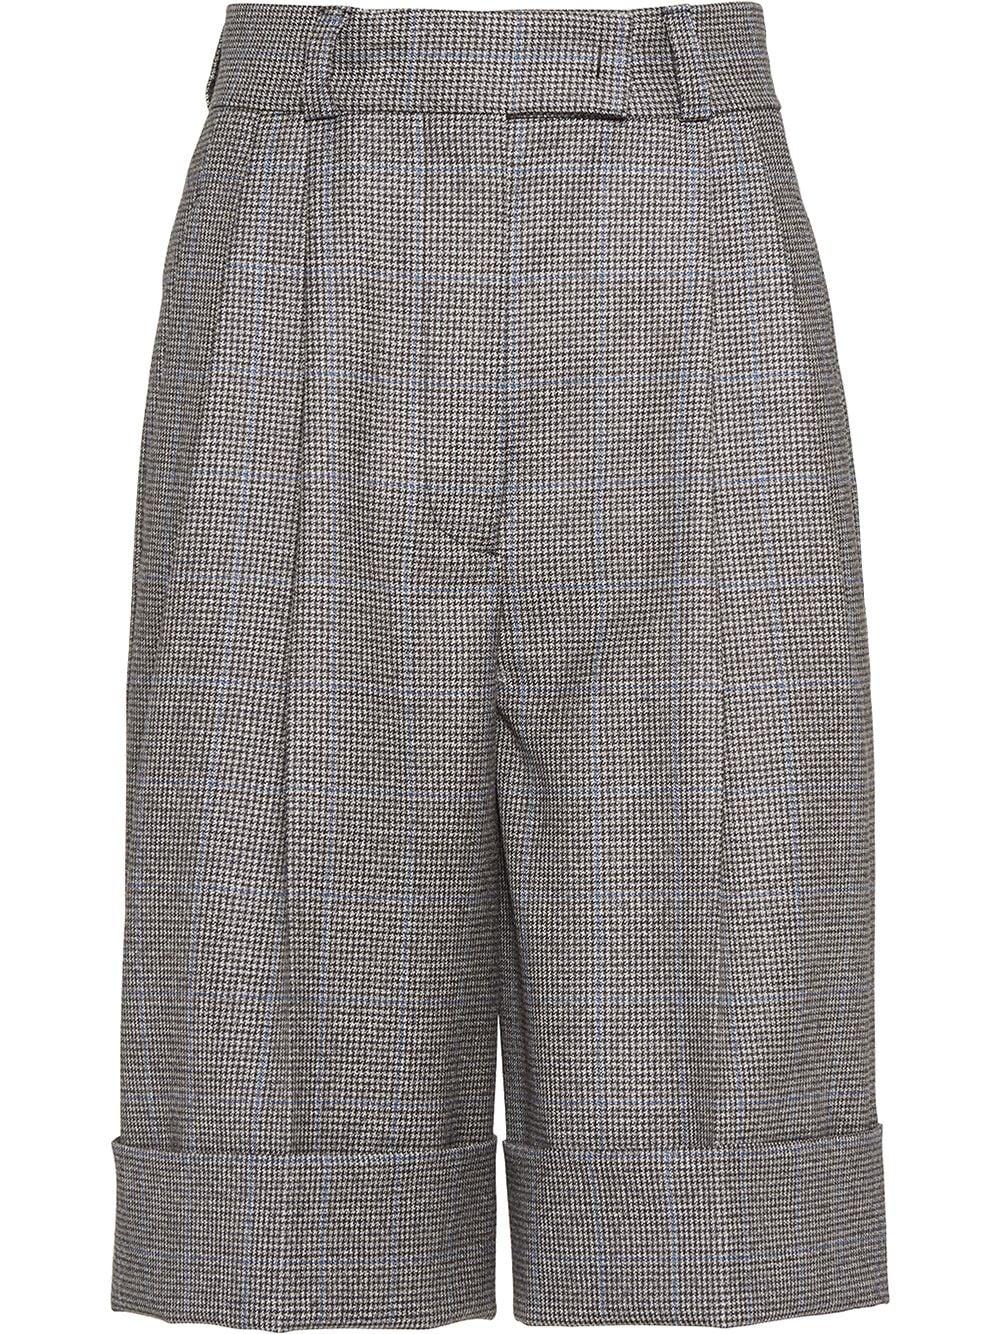 Miu Miu Shorts mit Hahnentrittmuster - Grau